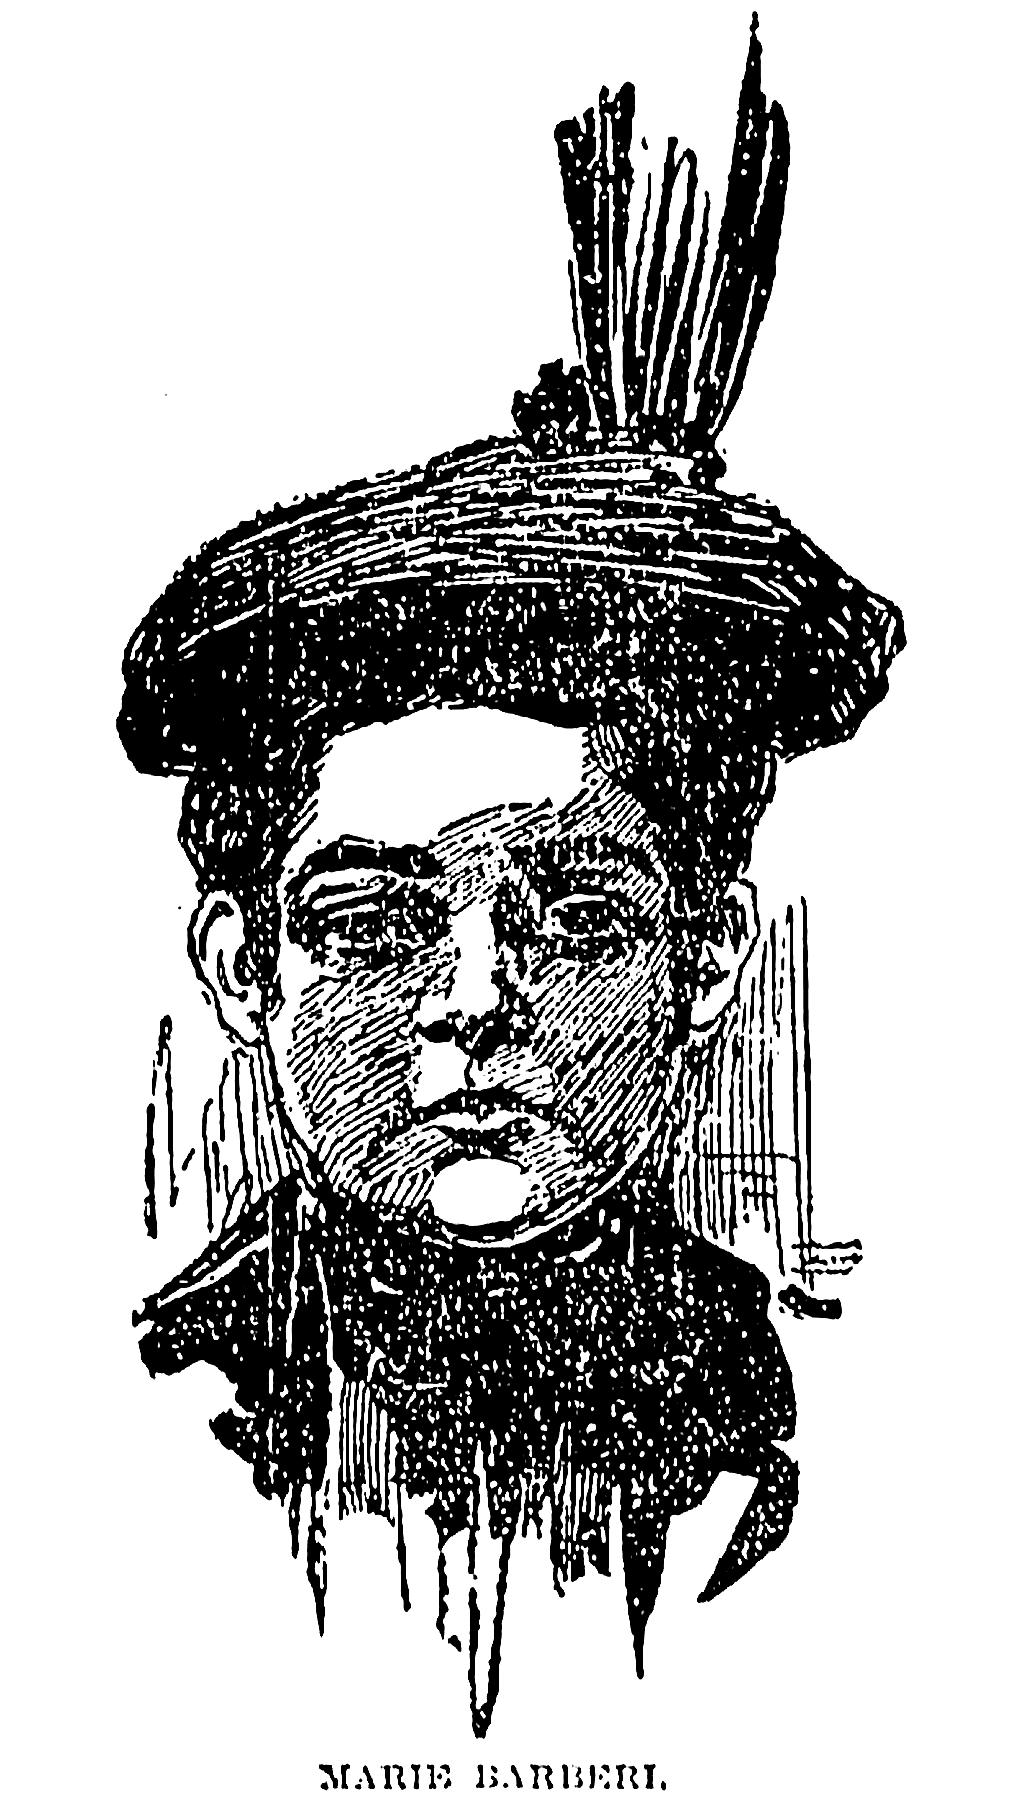 Maria Barbella - Wikipedia